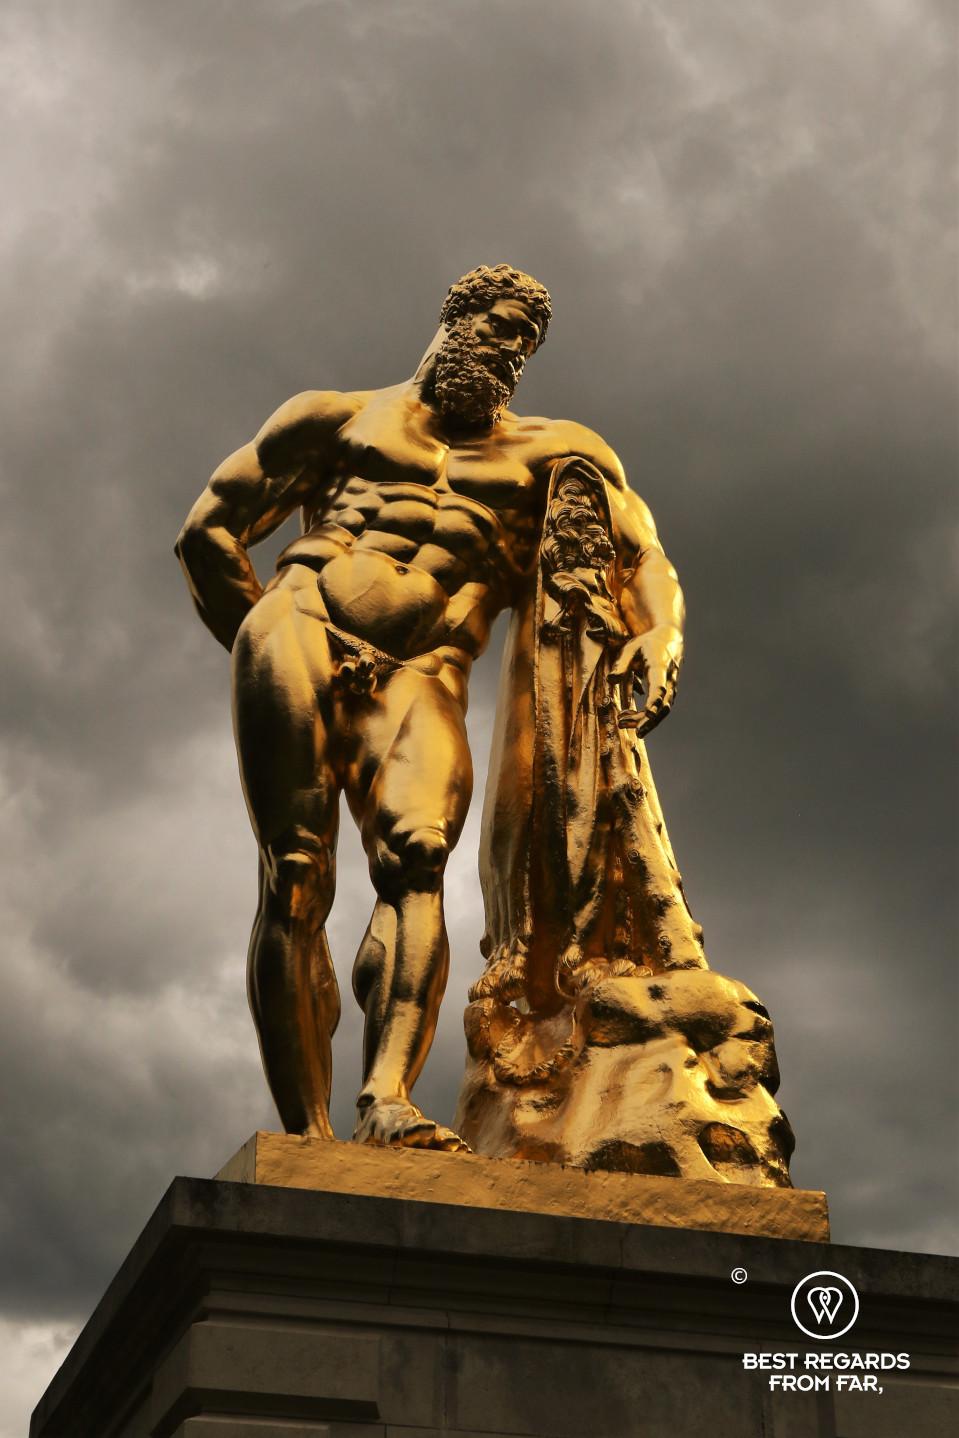 The golden sculpture of Hercule in the garden of the castle of Vaux le Vicomte, France.